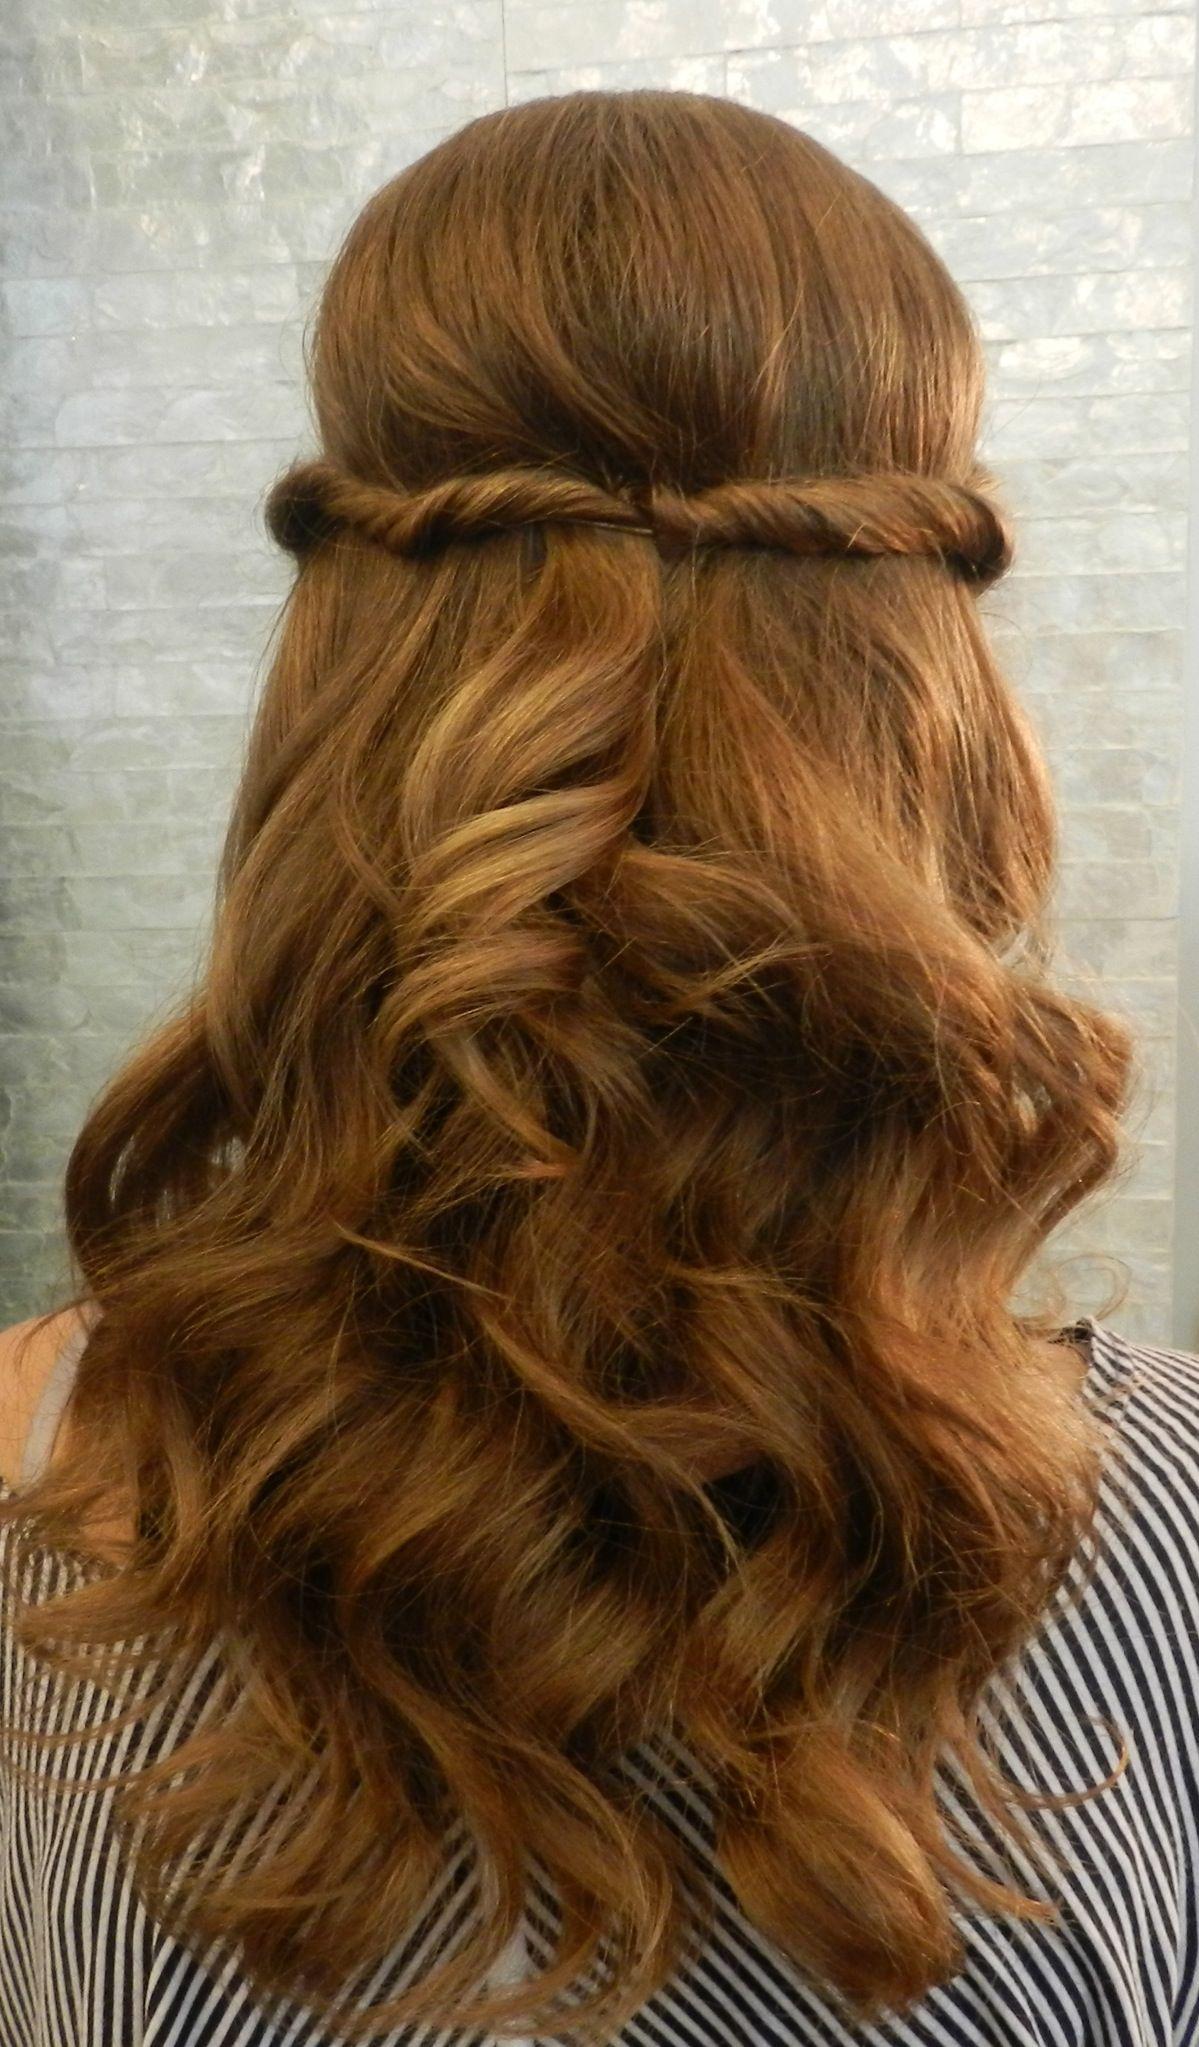 Th grade graduation hair so cute half up updo by tina rosado